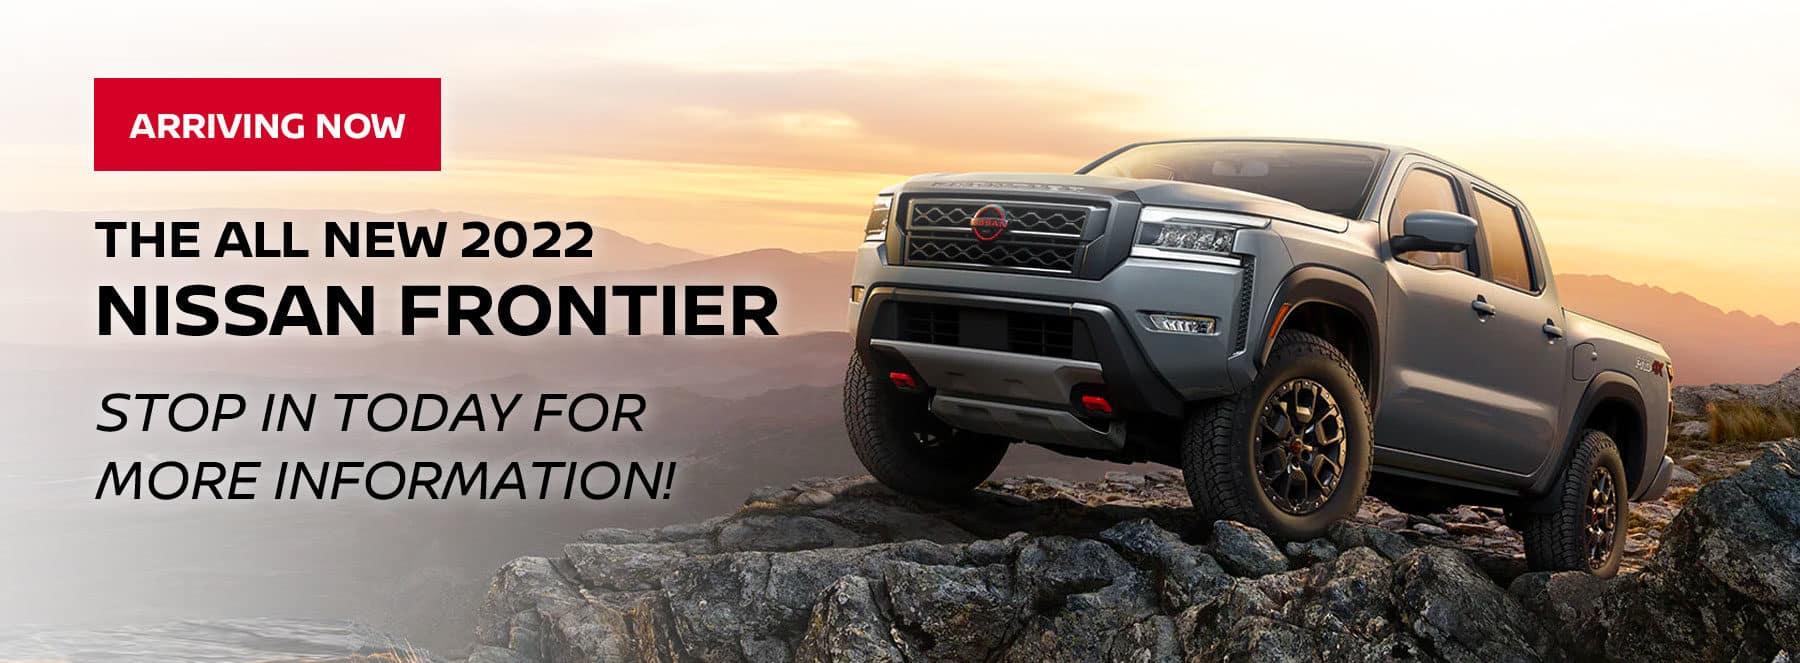 Coming Soon 2022 Nissan Frontier